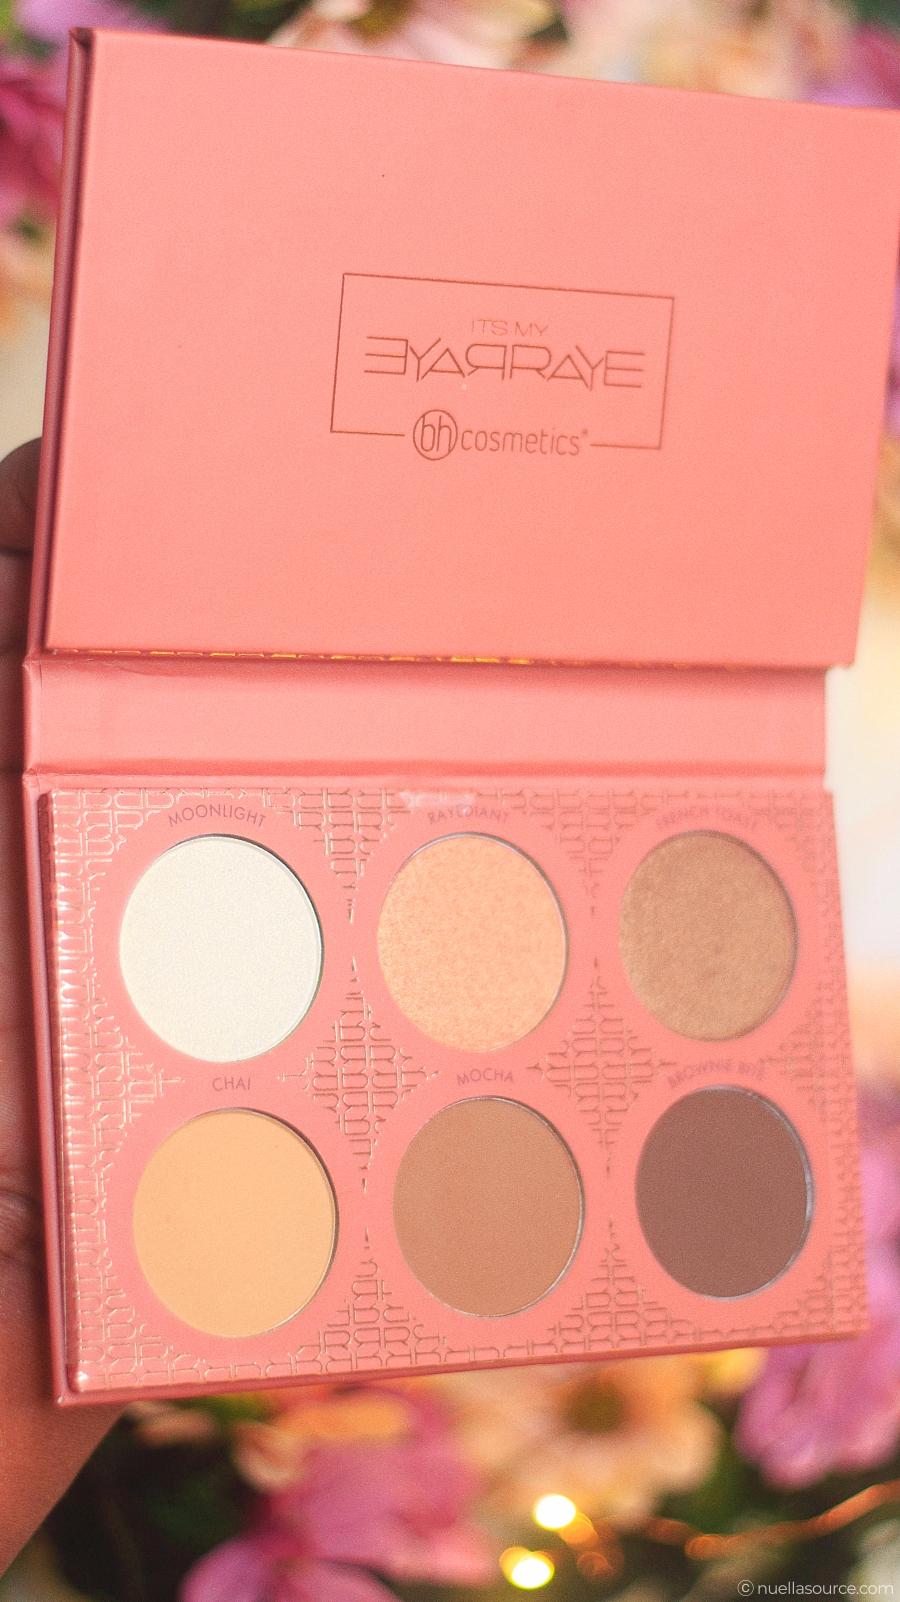 Palette BH Cosmetics Itsmyrayeraye highlighter contouring